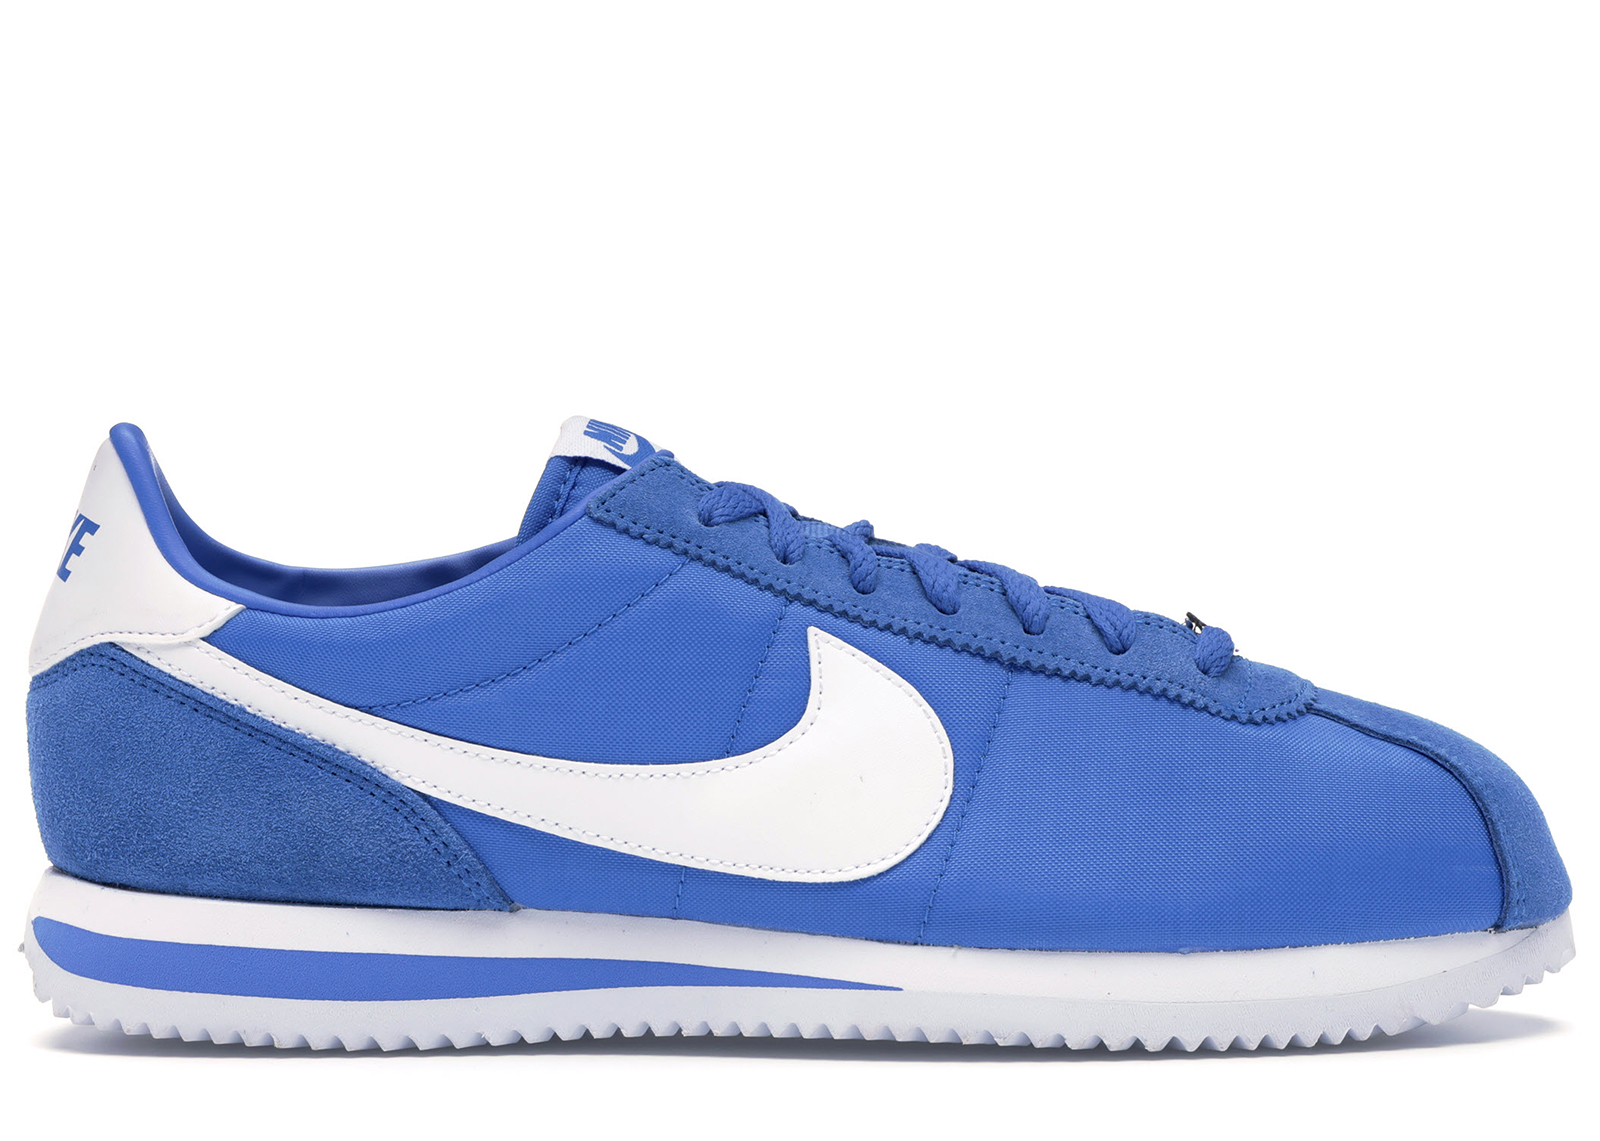 Nike Classic Cortez Nylon Signal Blue - 819720-402